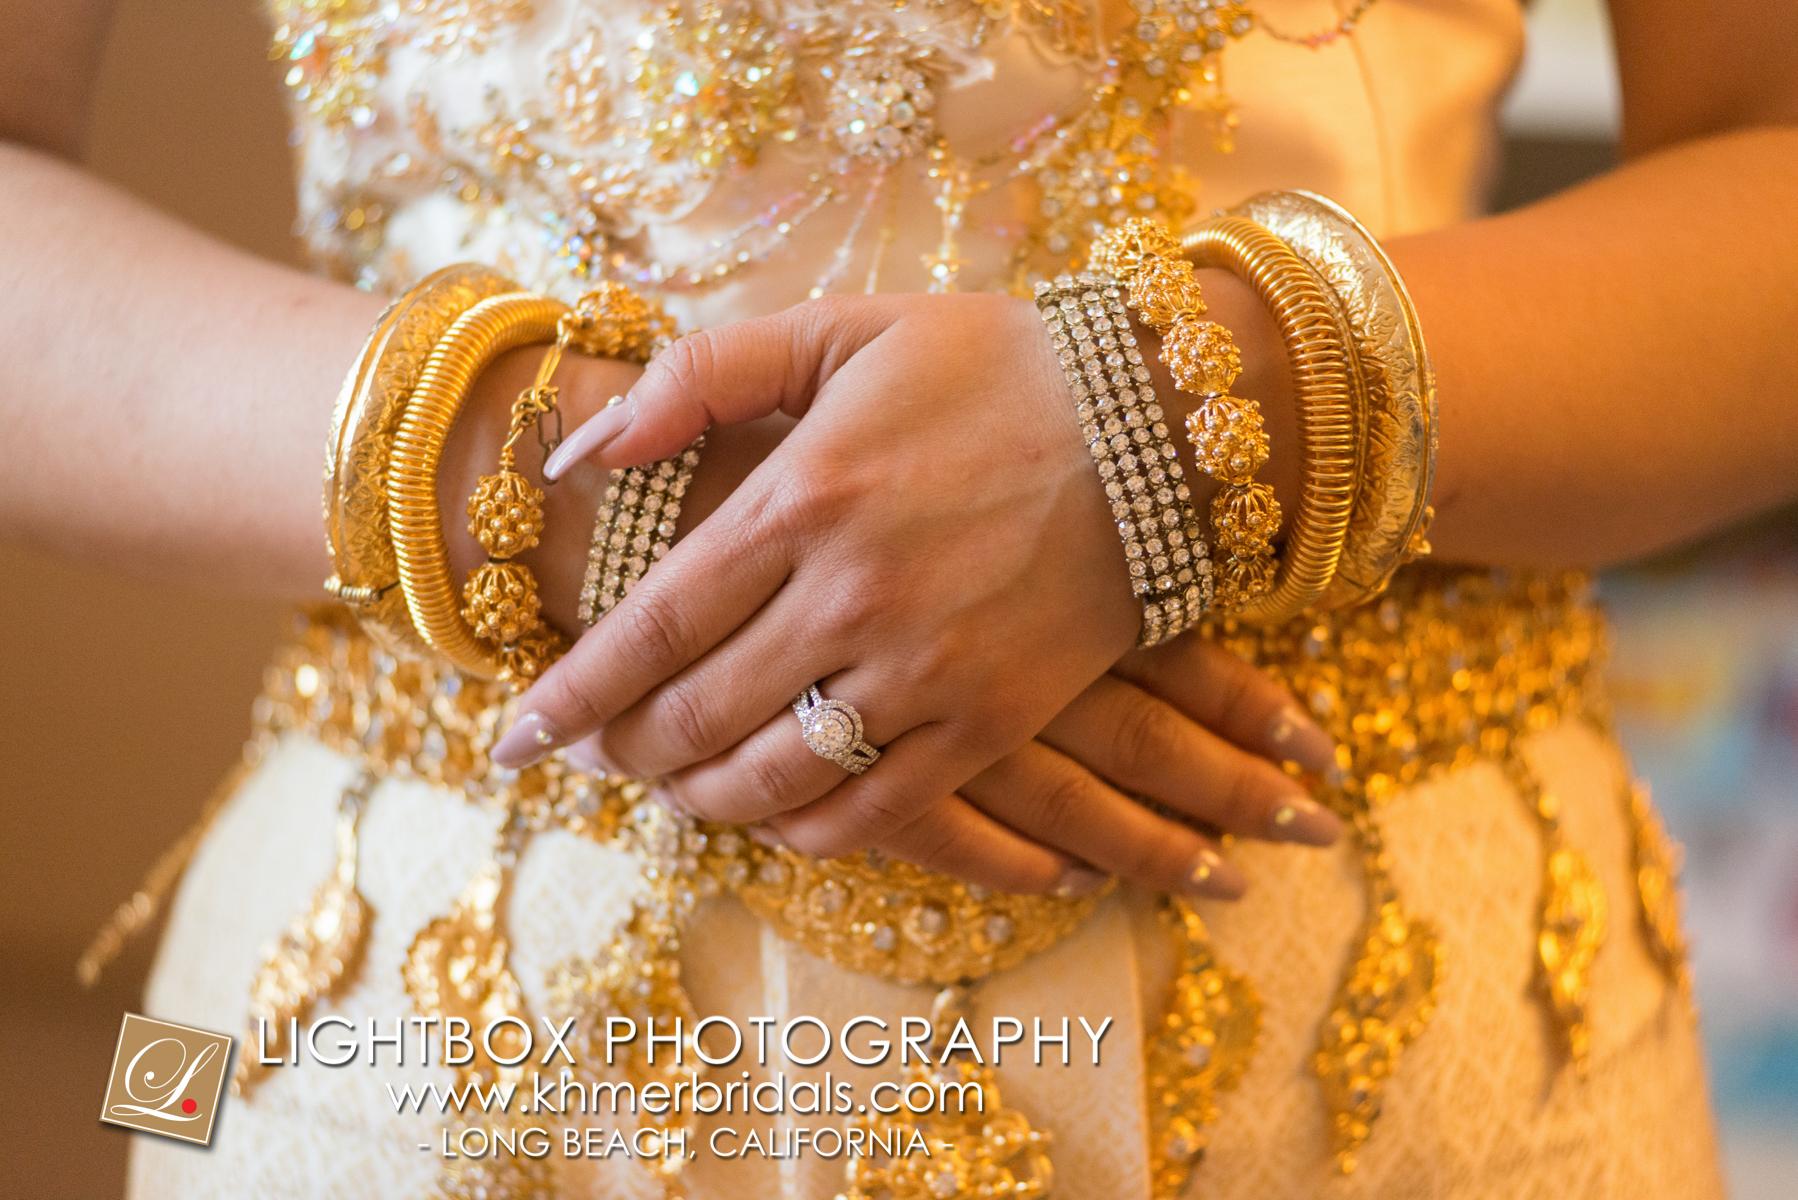 Khmer Bridal Wedding Photography video Apsara Studio Oufit-106.jpg